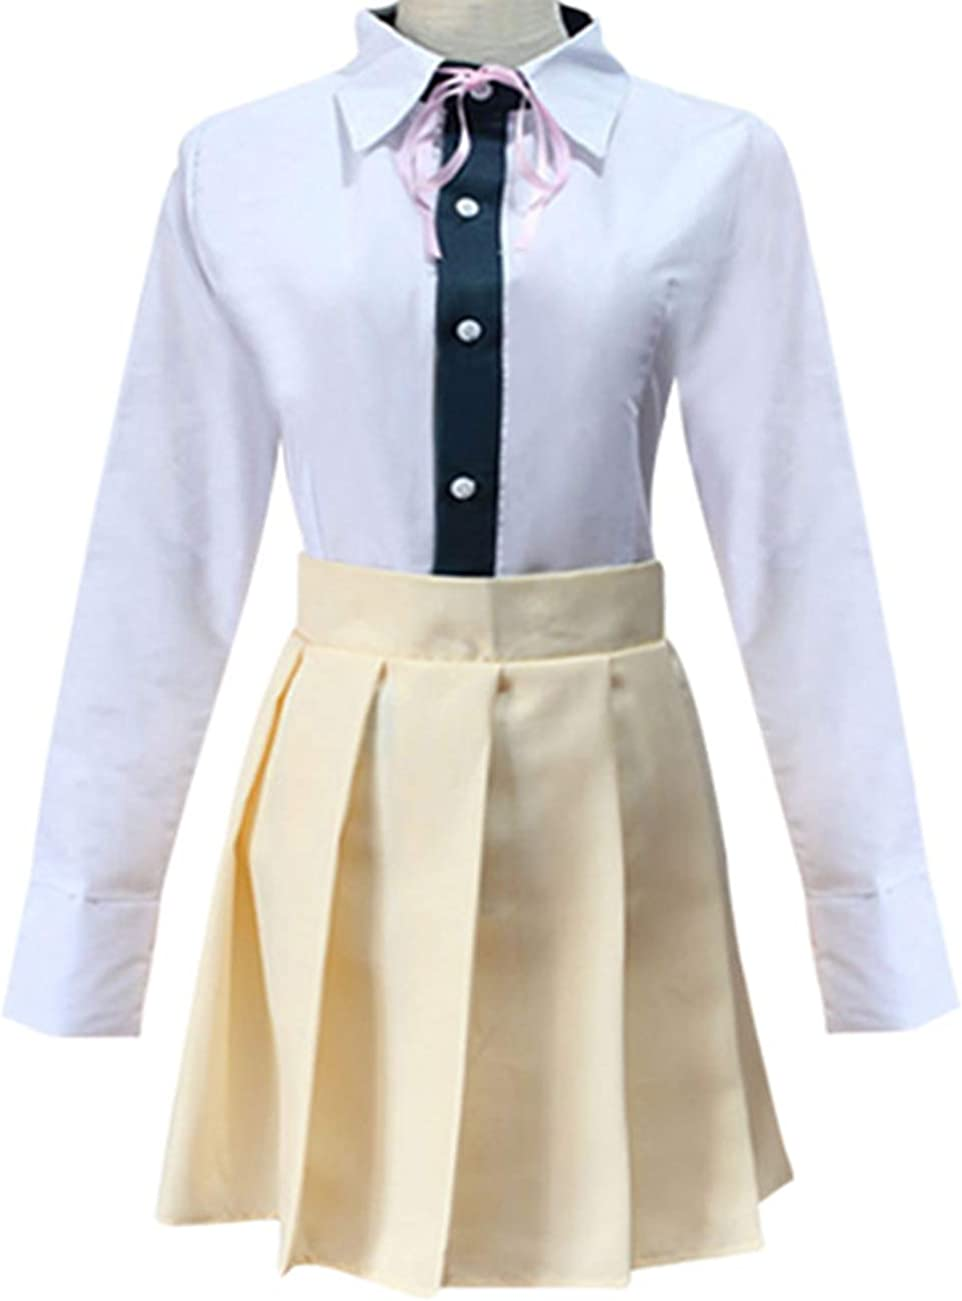 Tinyones Chiaki Nanami Cosplay Outfit High School Uniform Halloween Costume